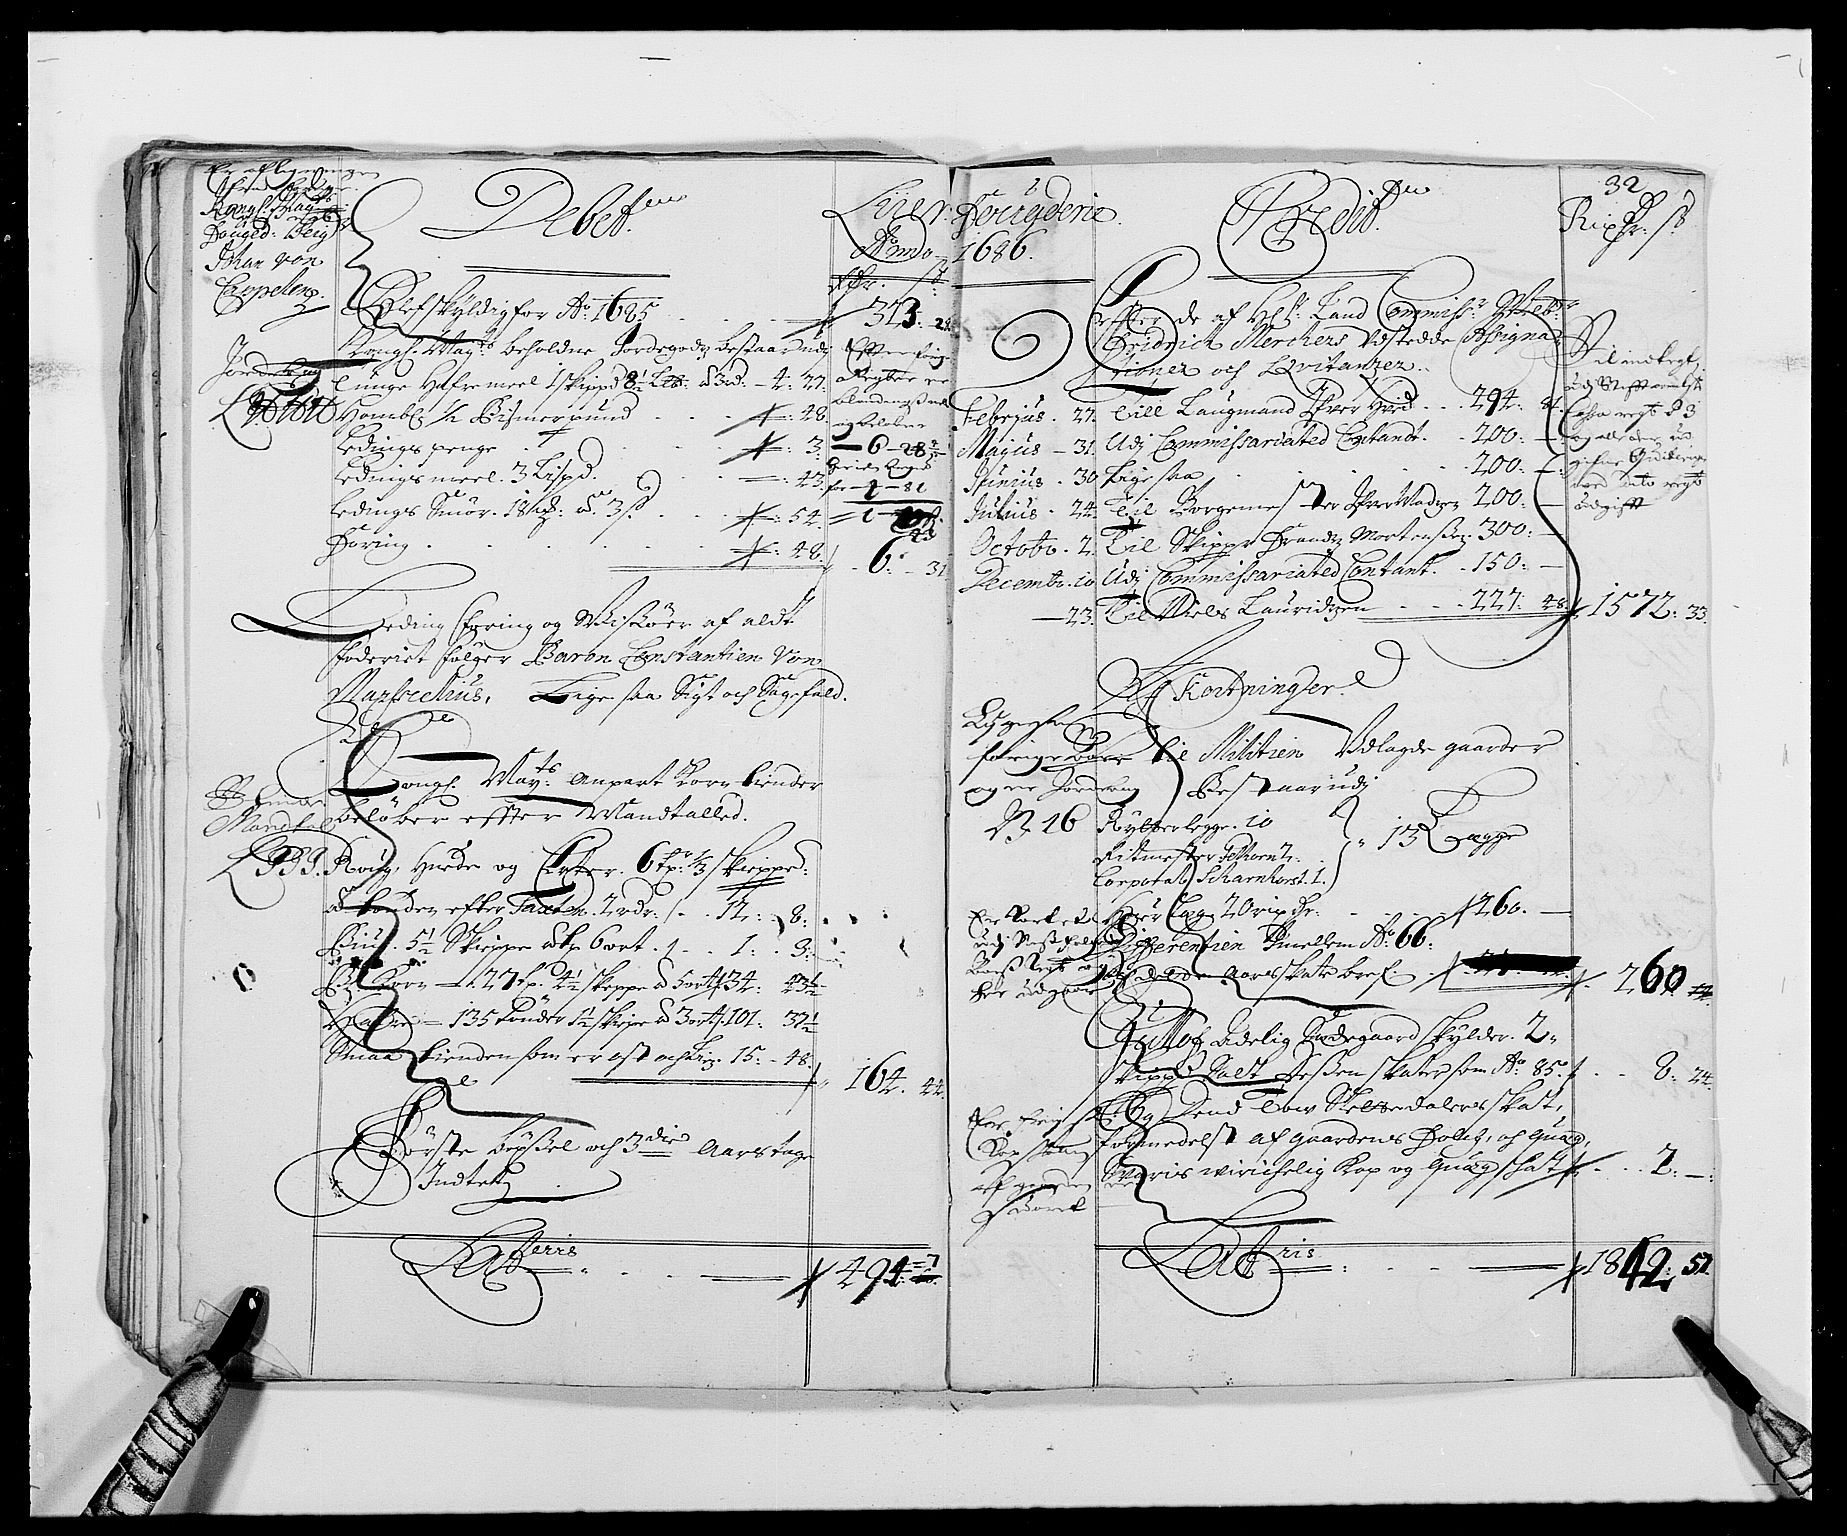 RA, Rentekammeret inntil 1814, Reviderte regnskaper, Fogderegnskap, R27/L1686: Fogderegnskap Lier, 1678-1686, s. 35